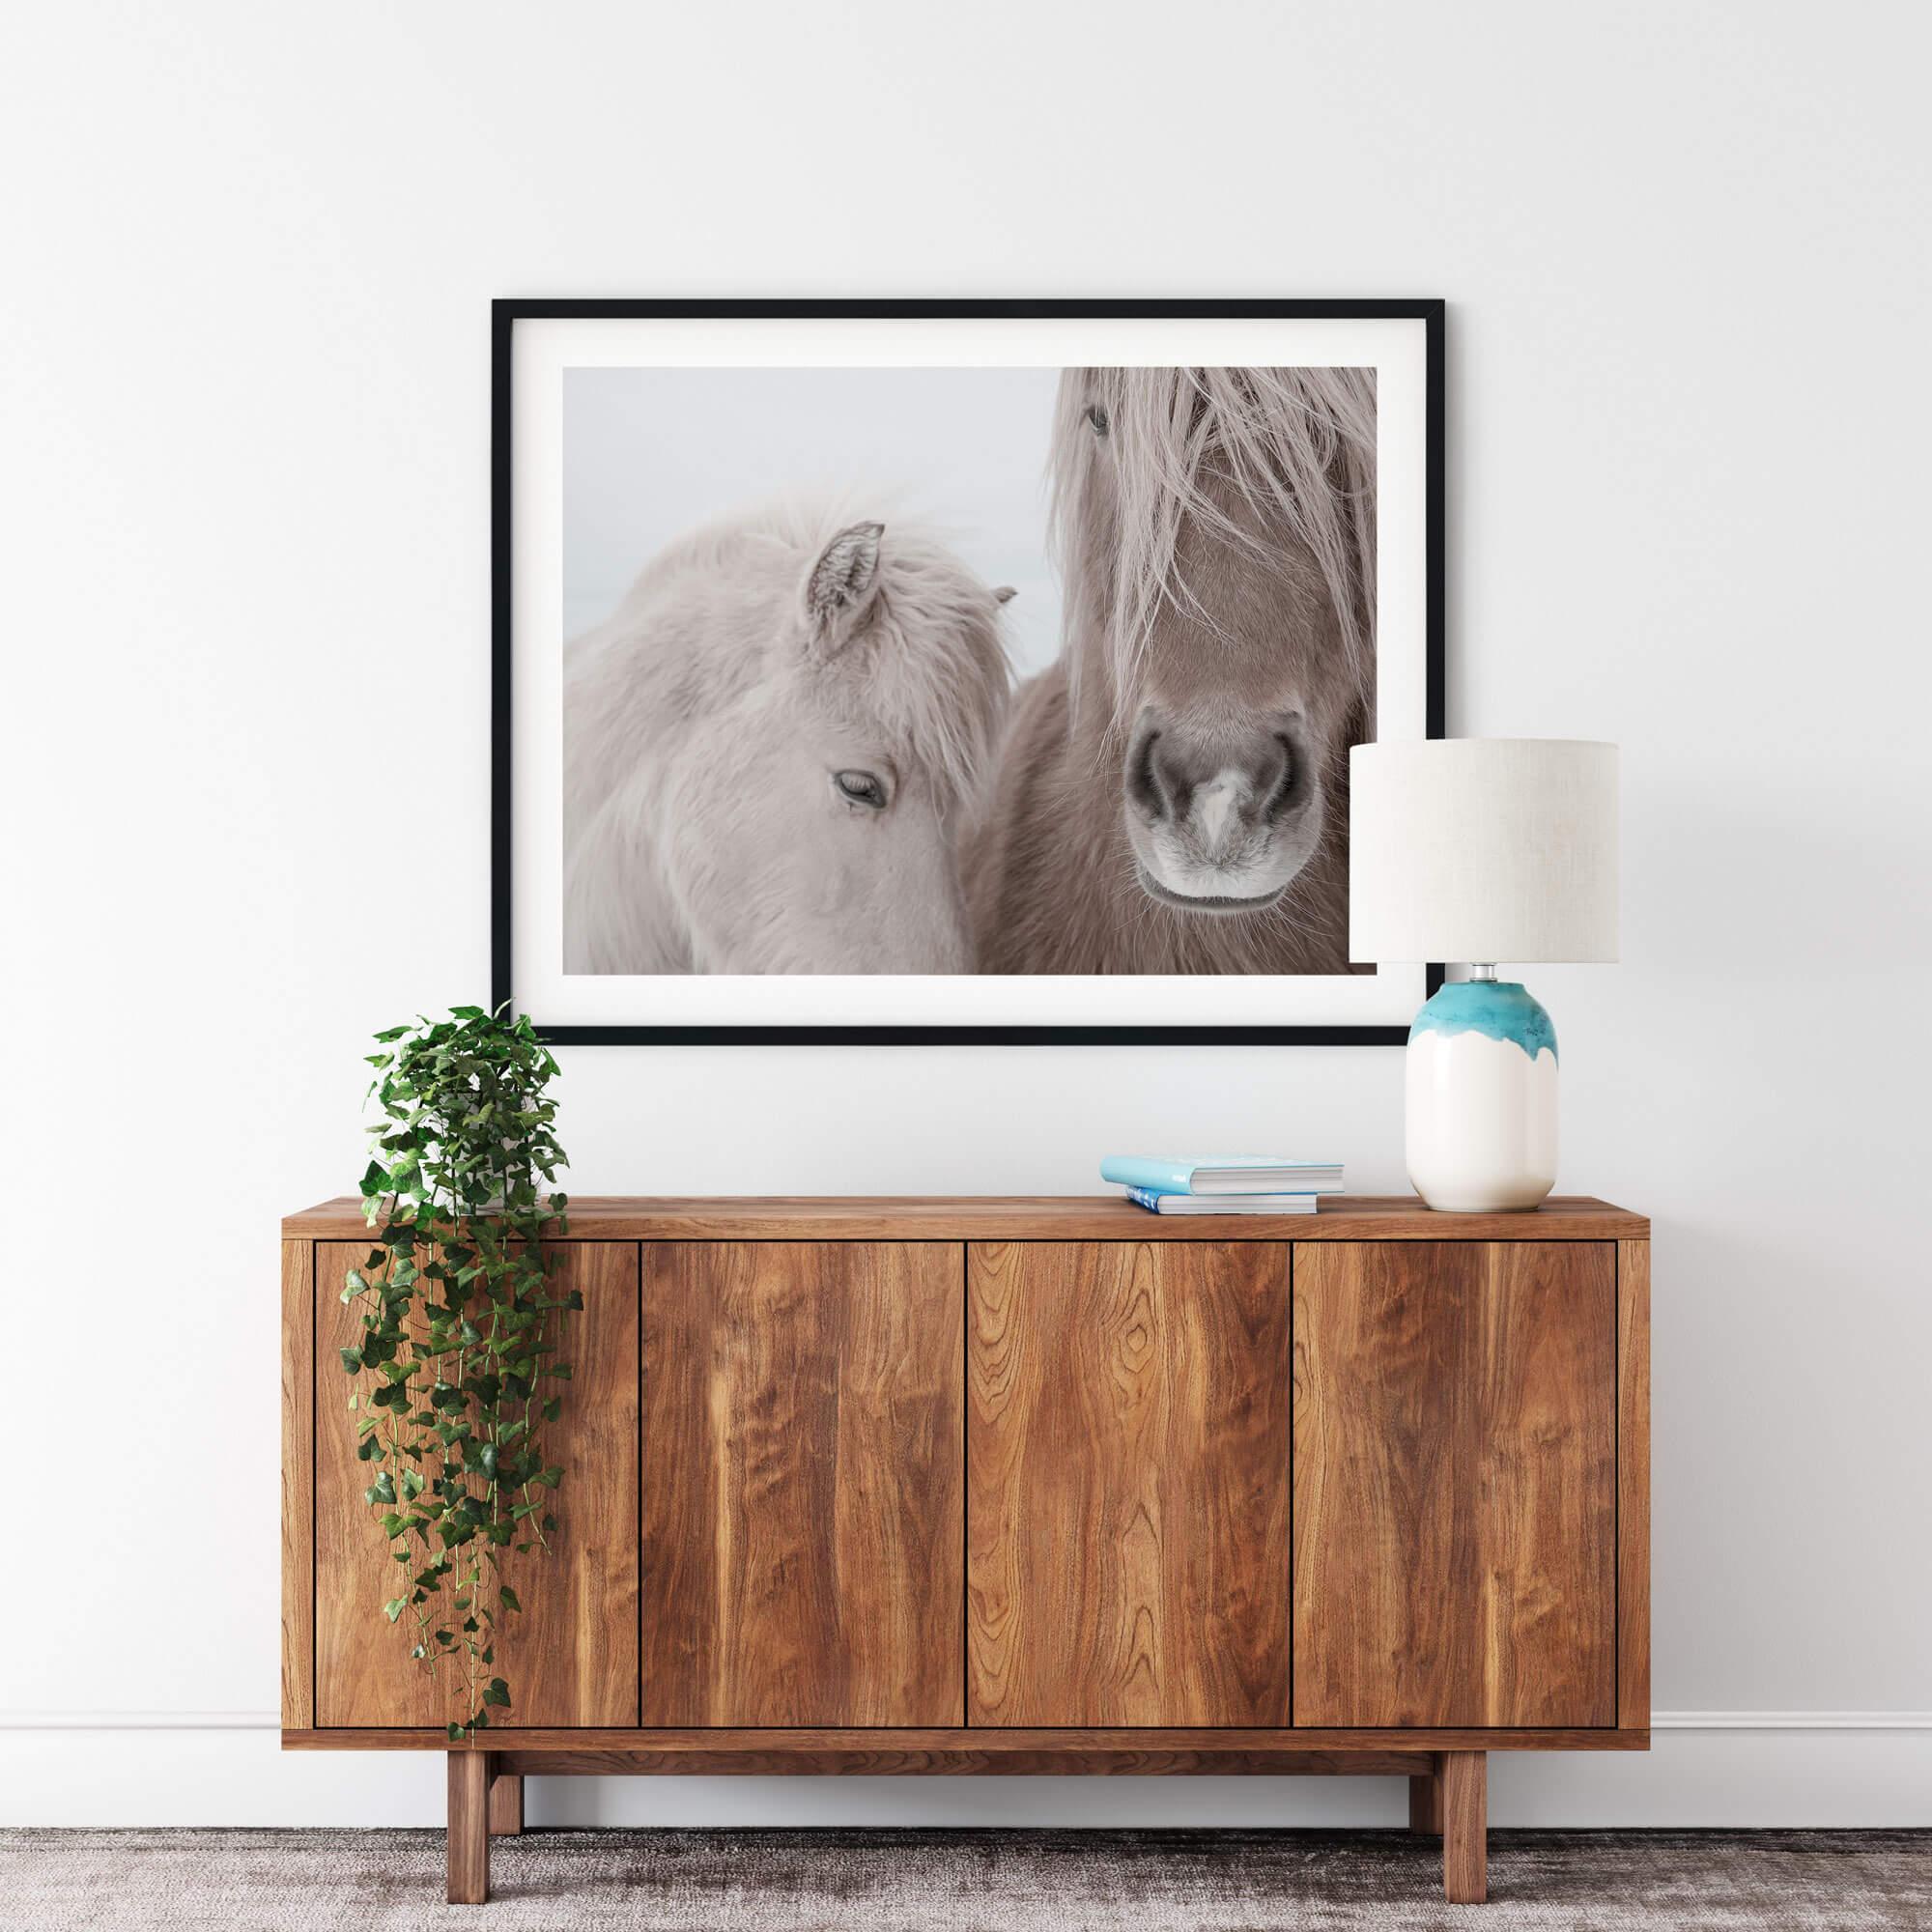 Two Horses Noanahiko Printable Wall Art 0144